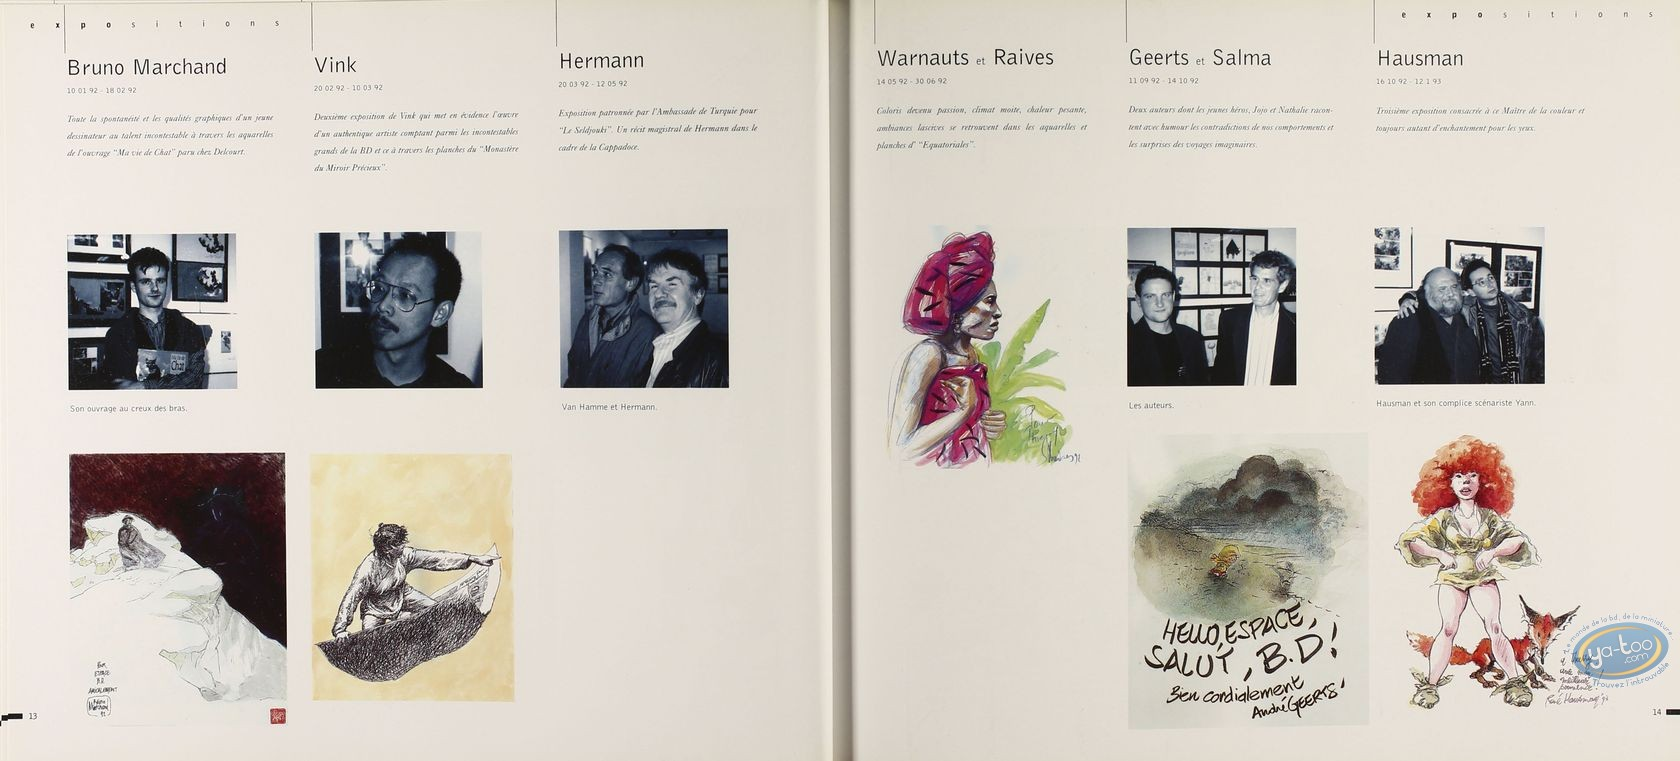 Carnet de croquis, Espace BD, catalogue expo 1986-1996